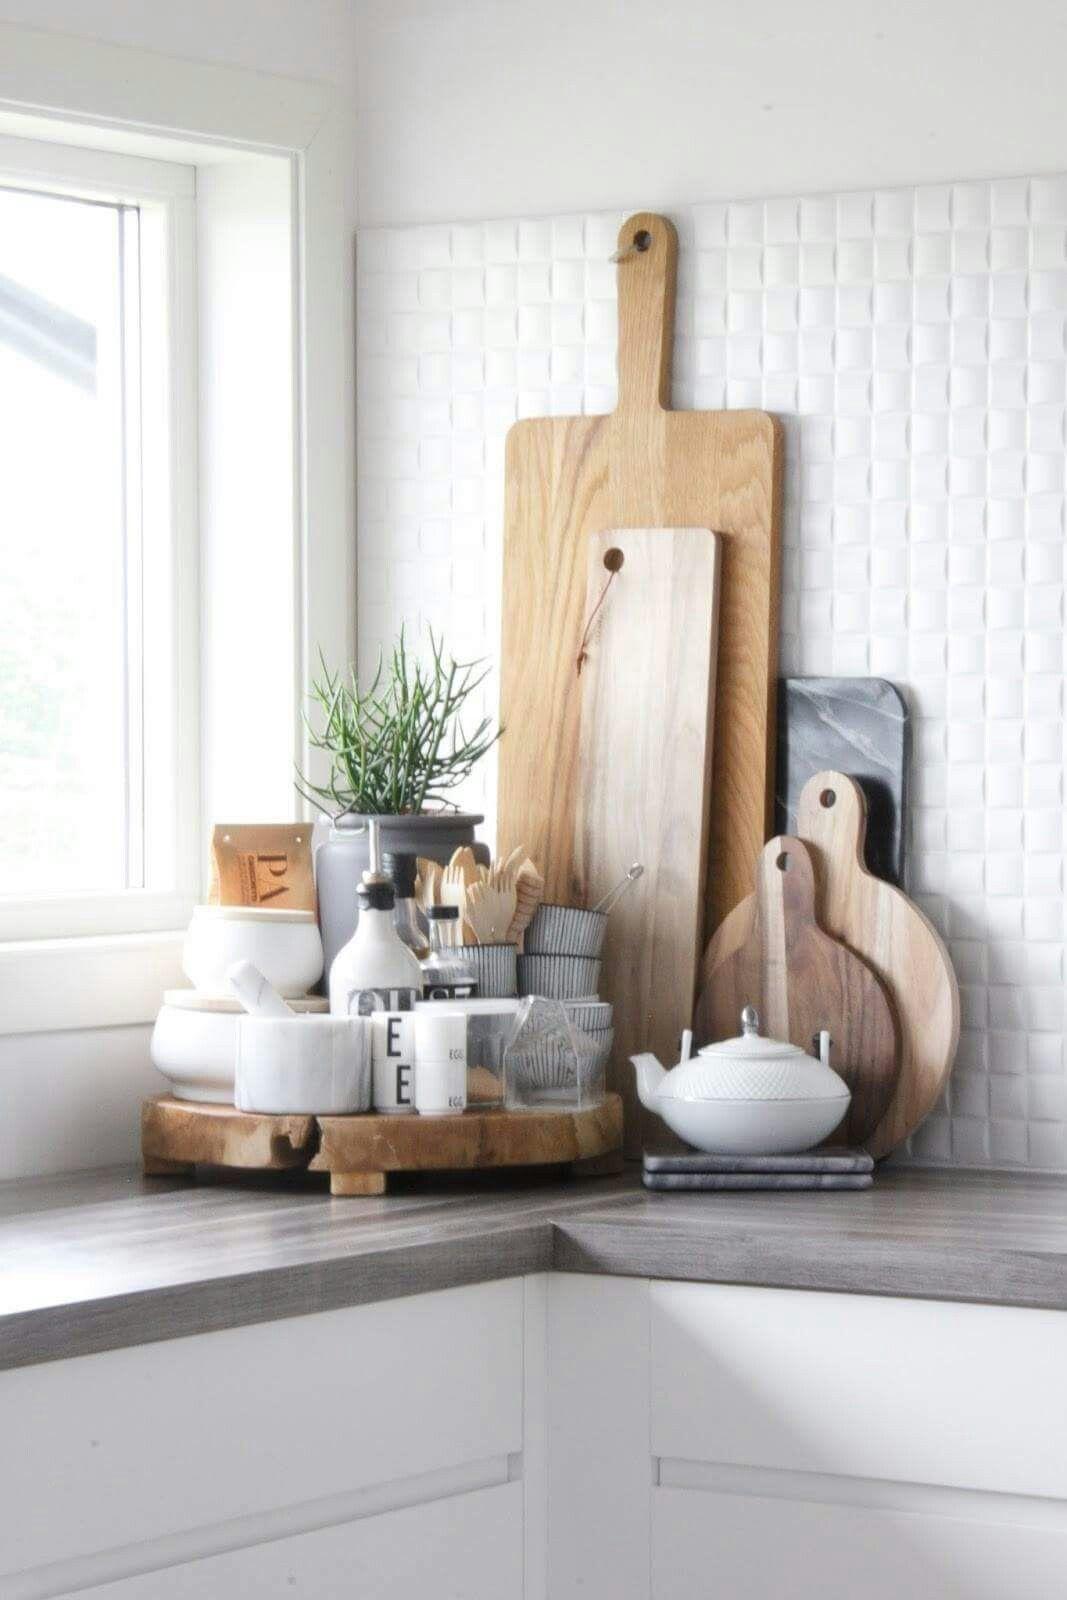 cutting boards on kitchen counter home kitchen kitchen decor rh pinterest com Decorated Kitchen Dark Counters Things to Decorate Kitchen Counter